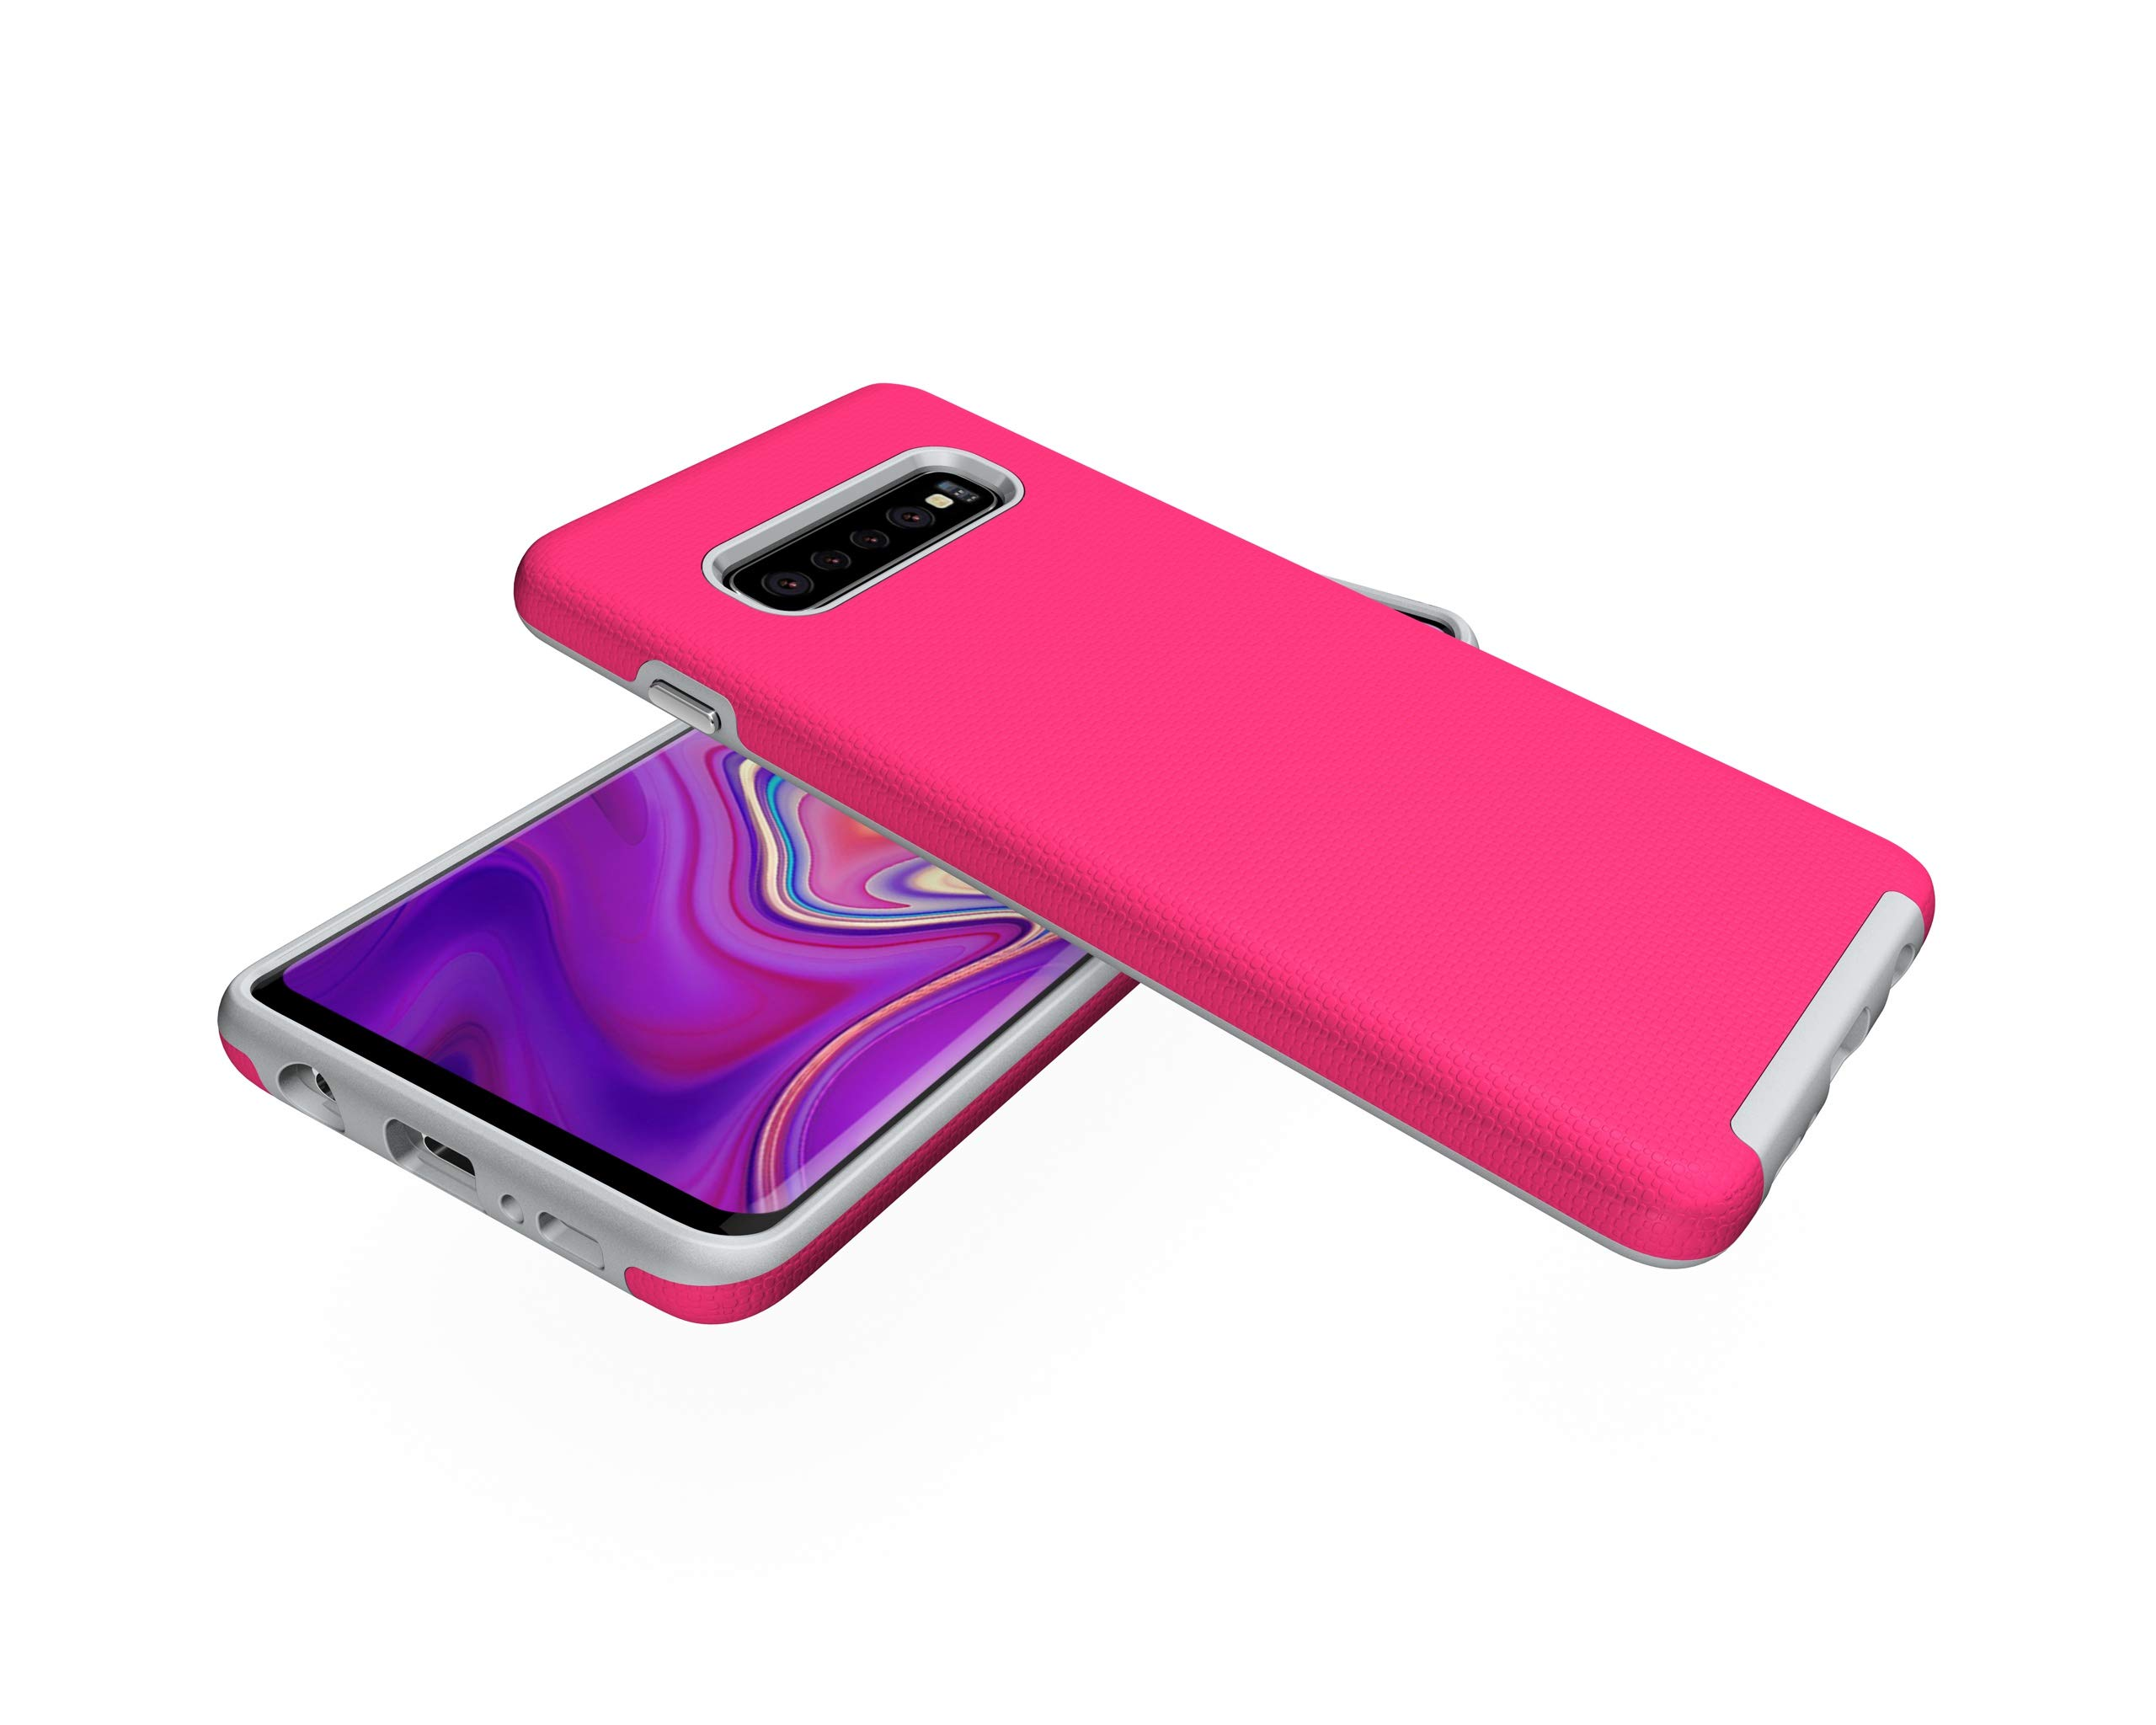 NOMO Galaxy S10 Case,Samsung S10 Hybrid Defender Armor Case,Dual Layer Protective Phone Case,Full Body Rugged Case,Non-Slip Drop Protection Shock Proof Case for Samsung Galaxy S10 Hot Pink by NOMO (Image #3)